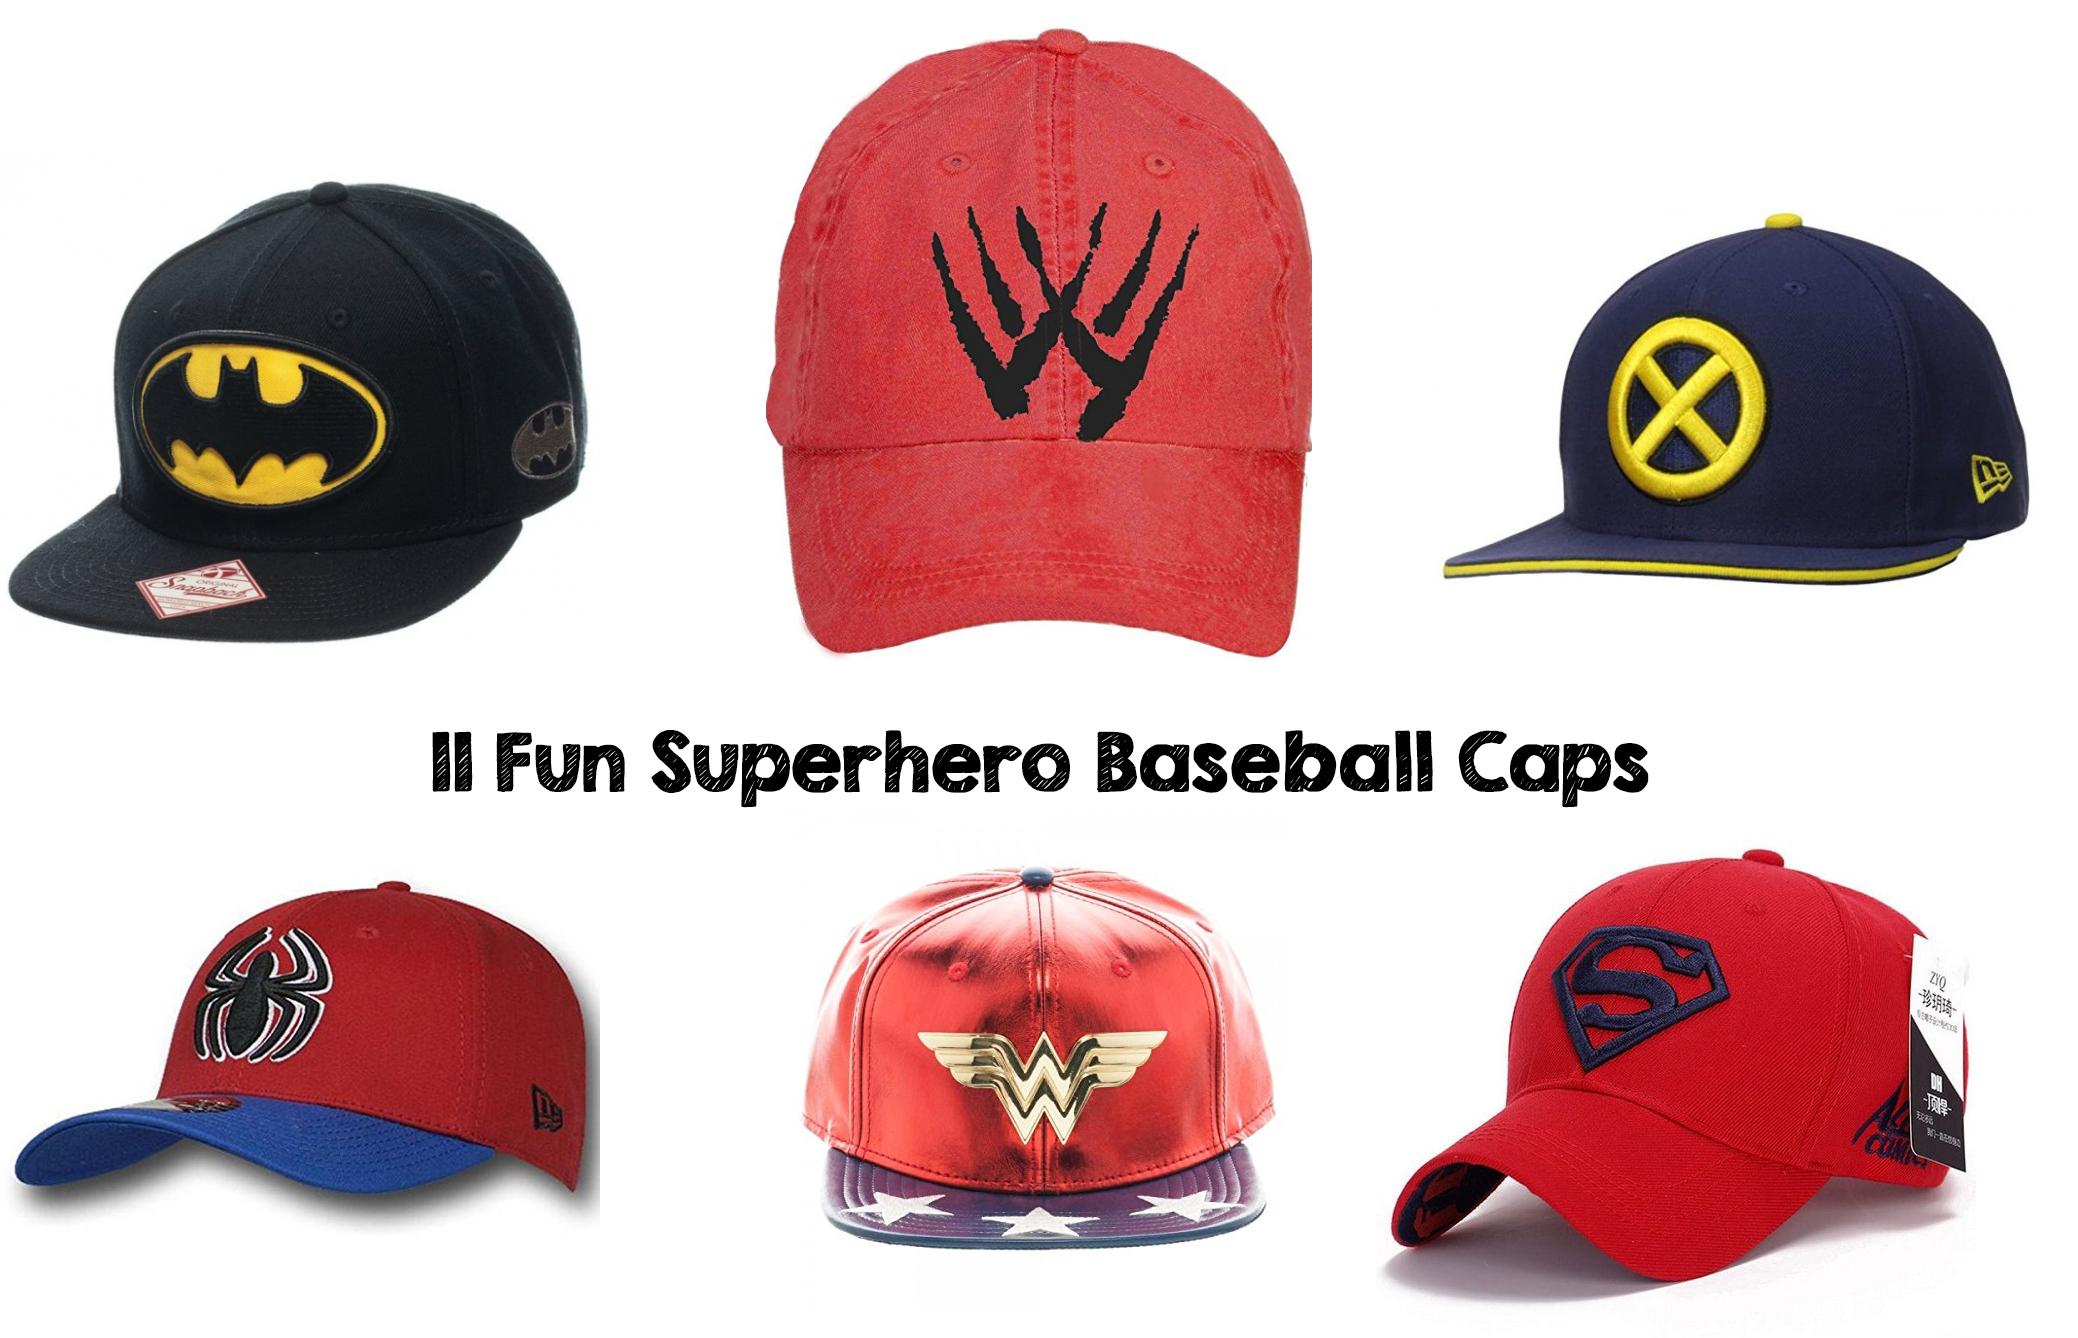 d0d843f2195f4 11 Fun Superhero Baseball Caps - Walyou